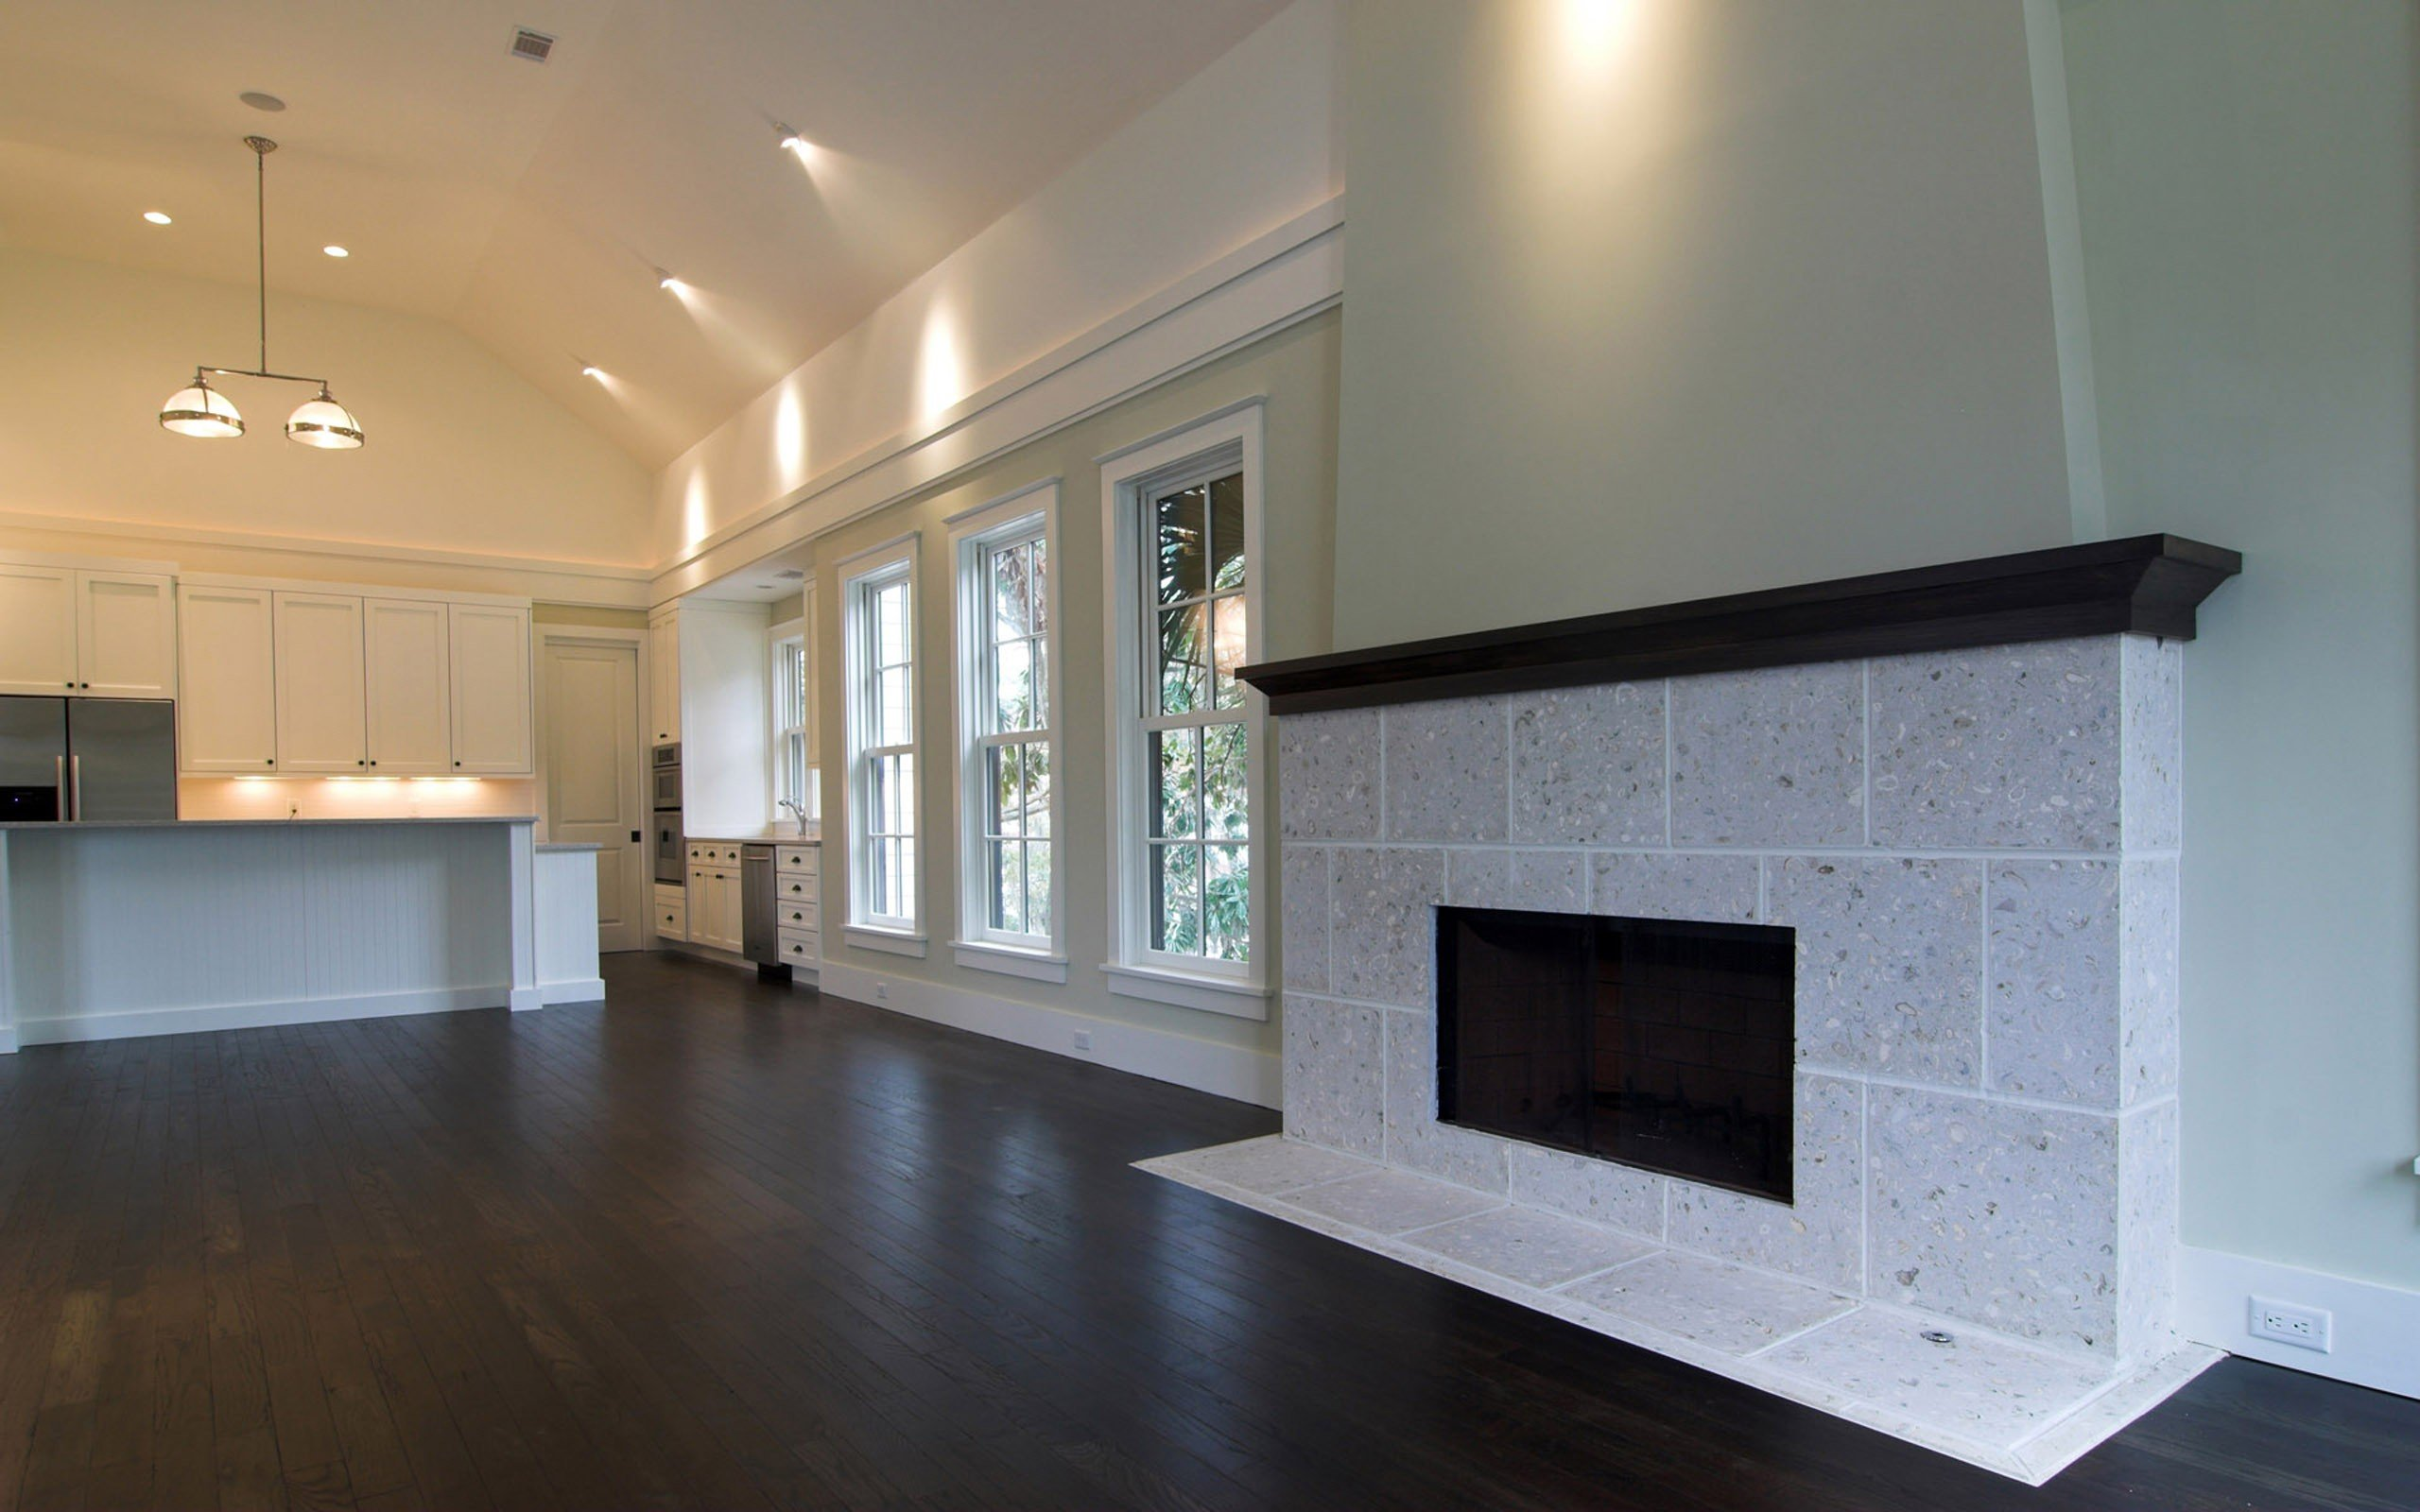 Architecture Living Room Empty Interior Design Wallpaper 2560x1600 310081